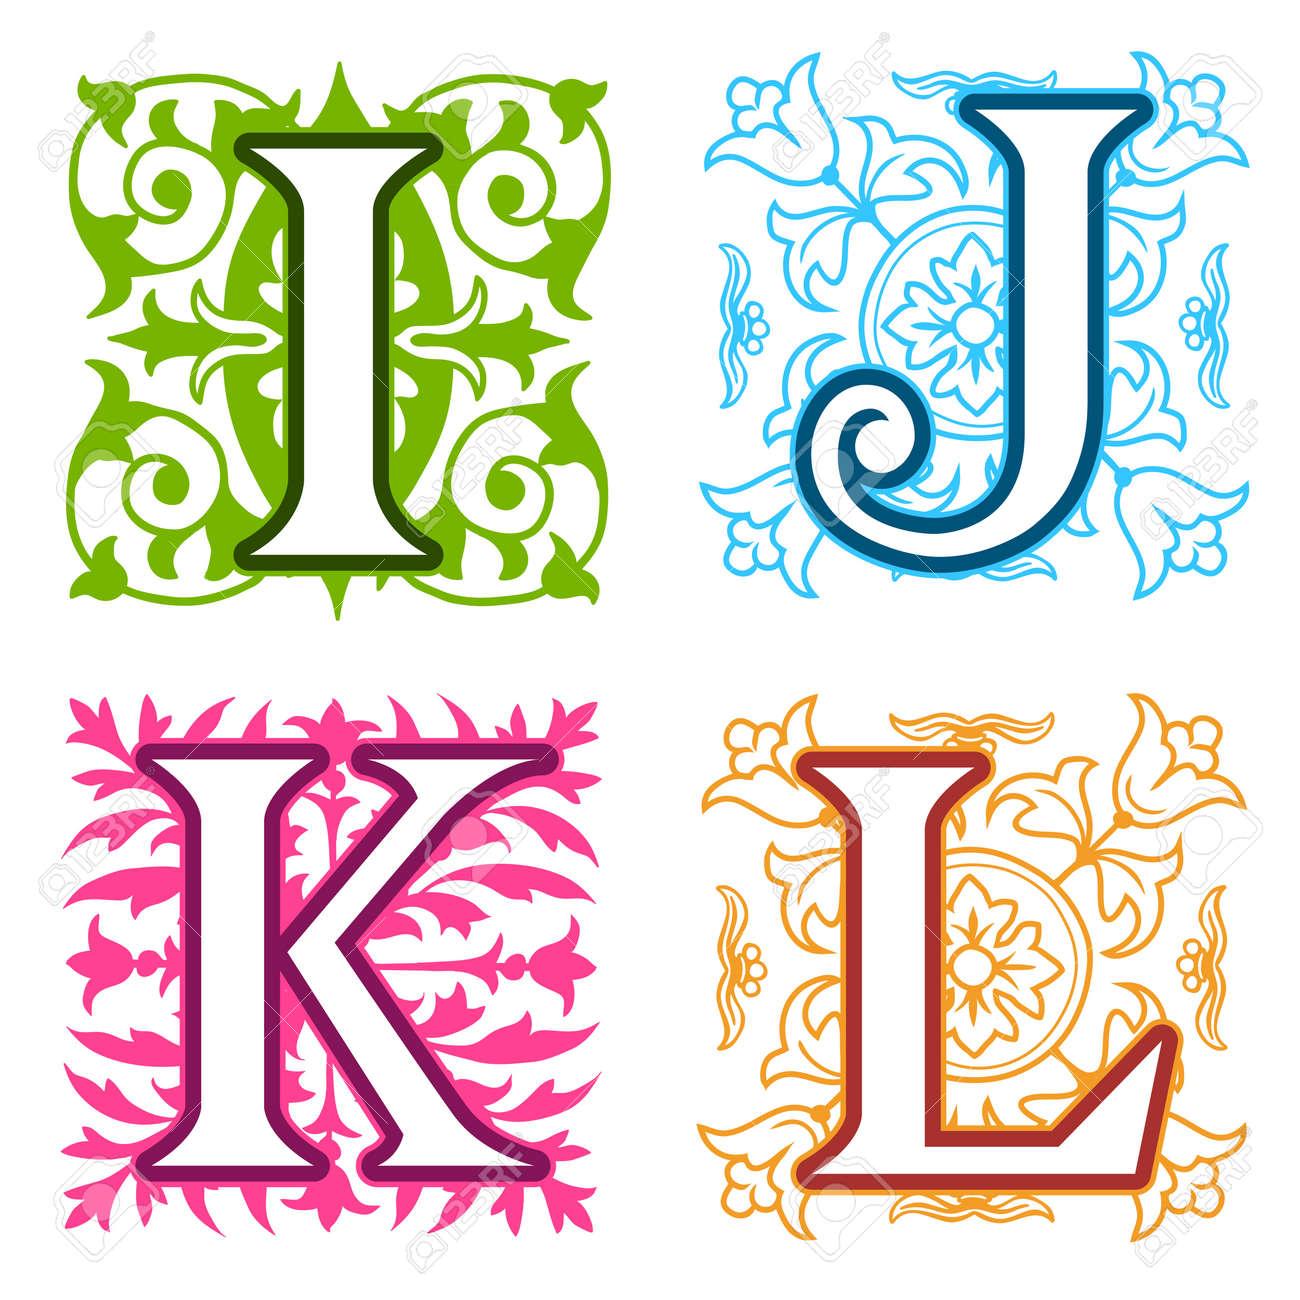 Decorative I J K L Alphabet Letters With Vintage Floral Elements